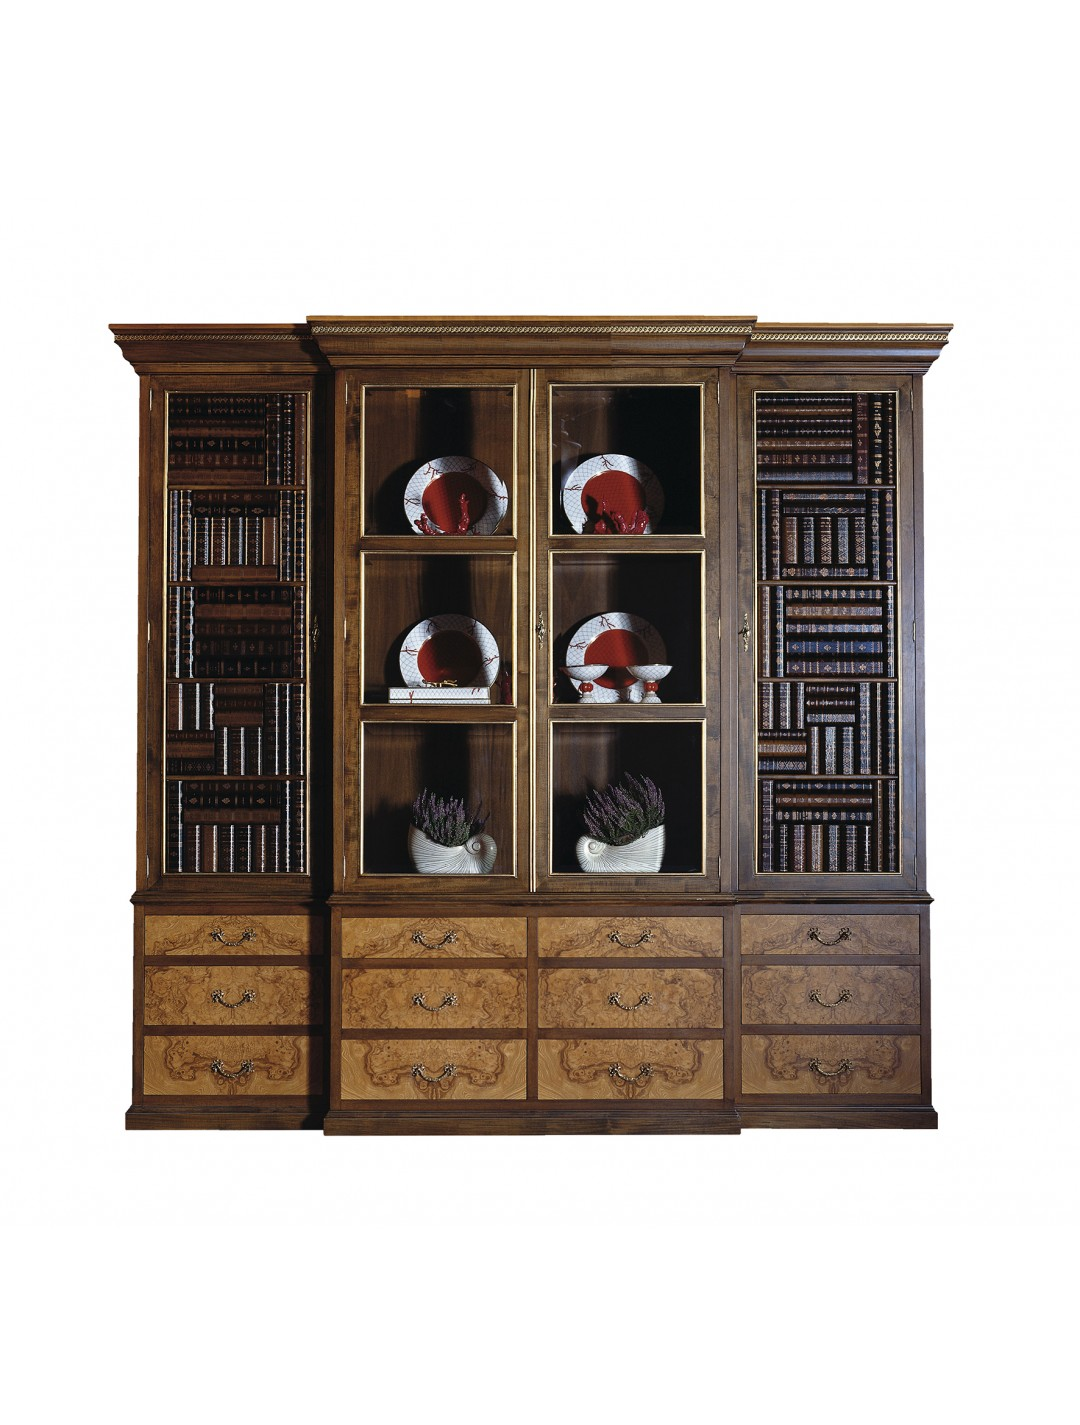 OLIVATO DISPLAY CABINET, LEATHER BOOK IMITATION DOORS, AGED OLIVE TREE ROOT VENEER DETAILS,